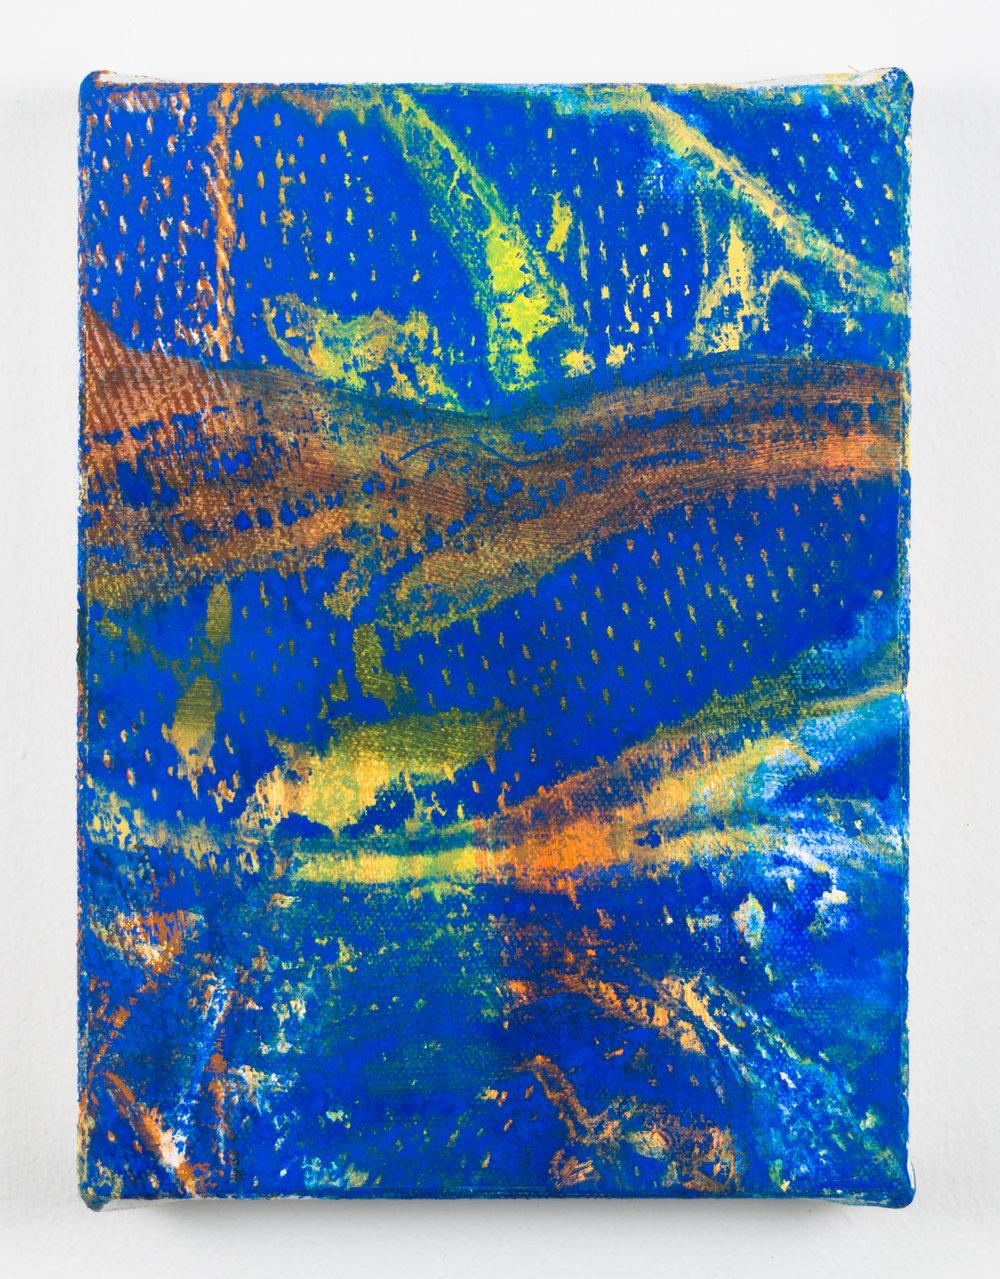 Impressions(Blue)_8x6_2018.jpg